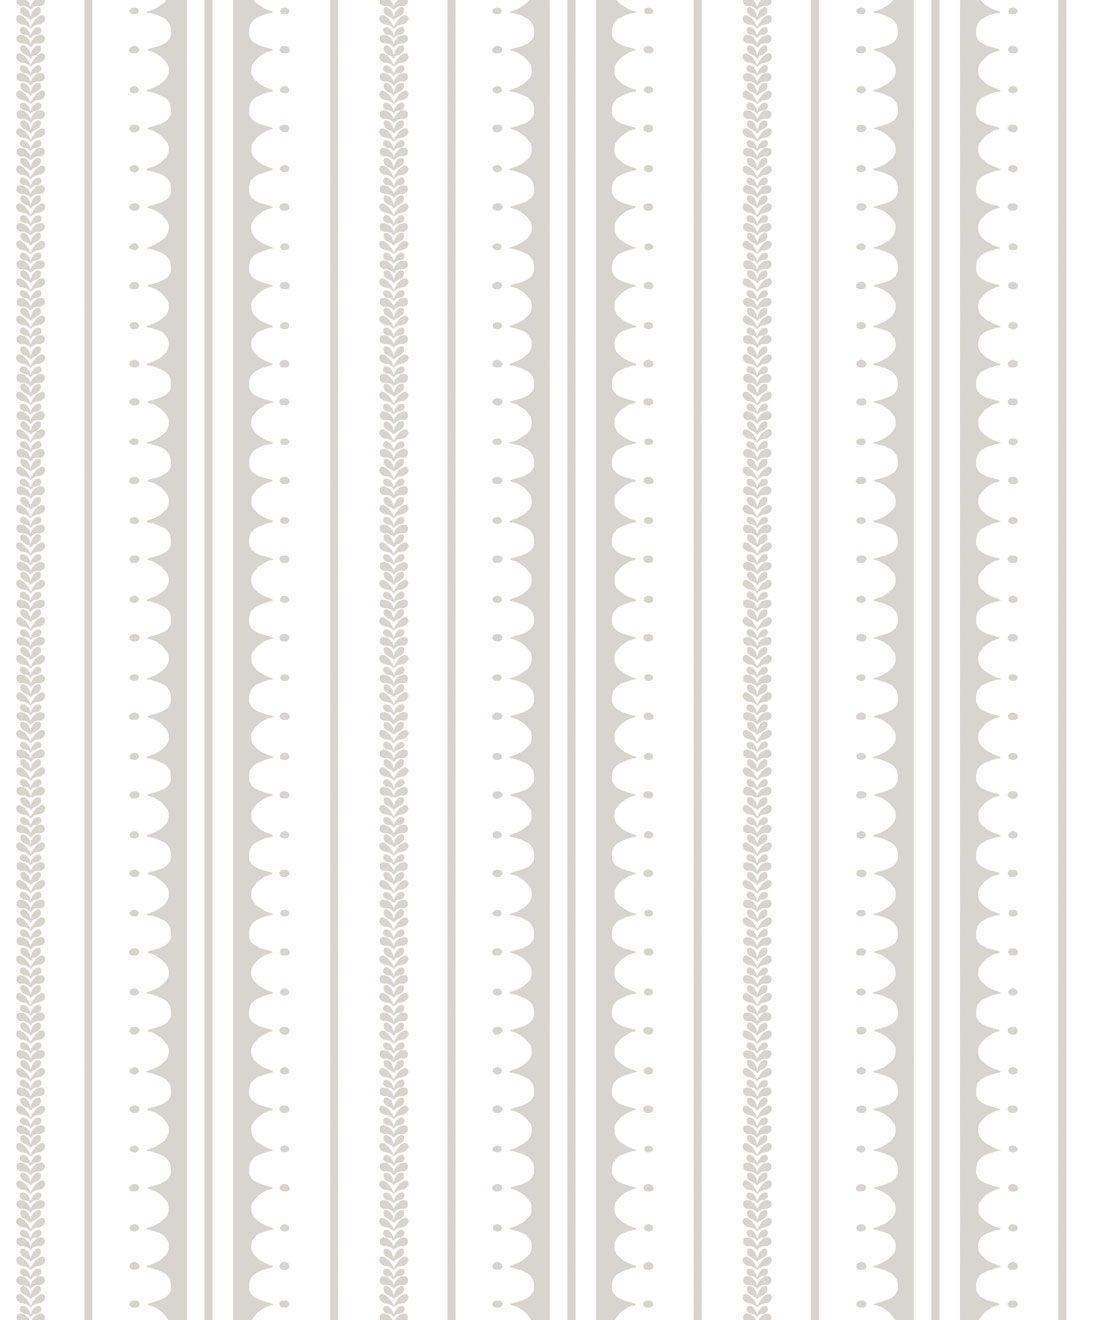 La Grand Coquille • Stripe and Scallop Wallpaper • Beige • Swatch